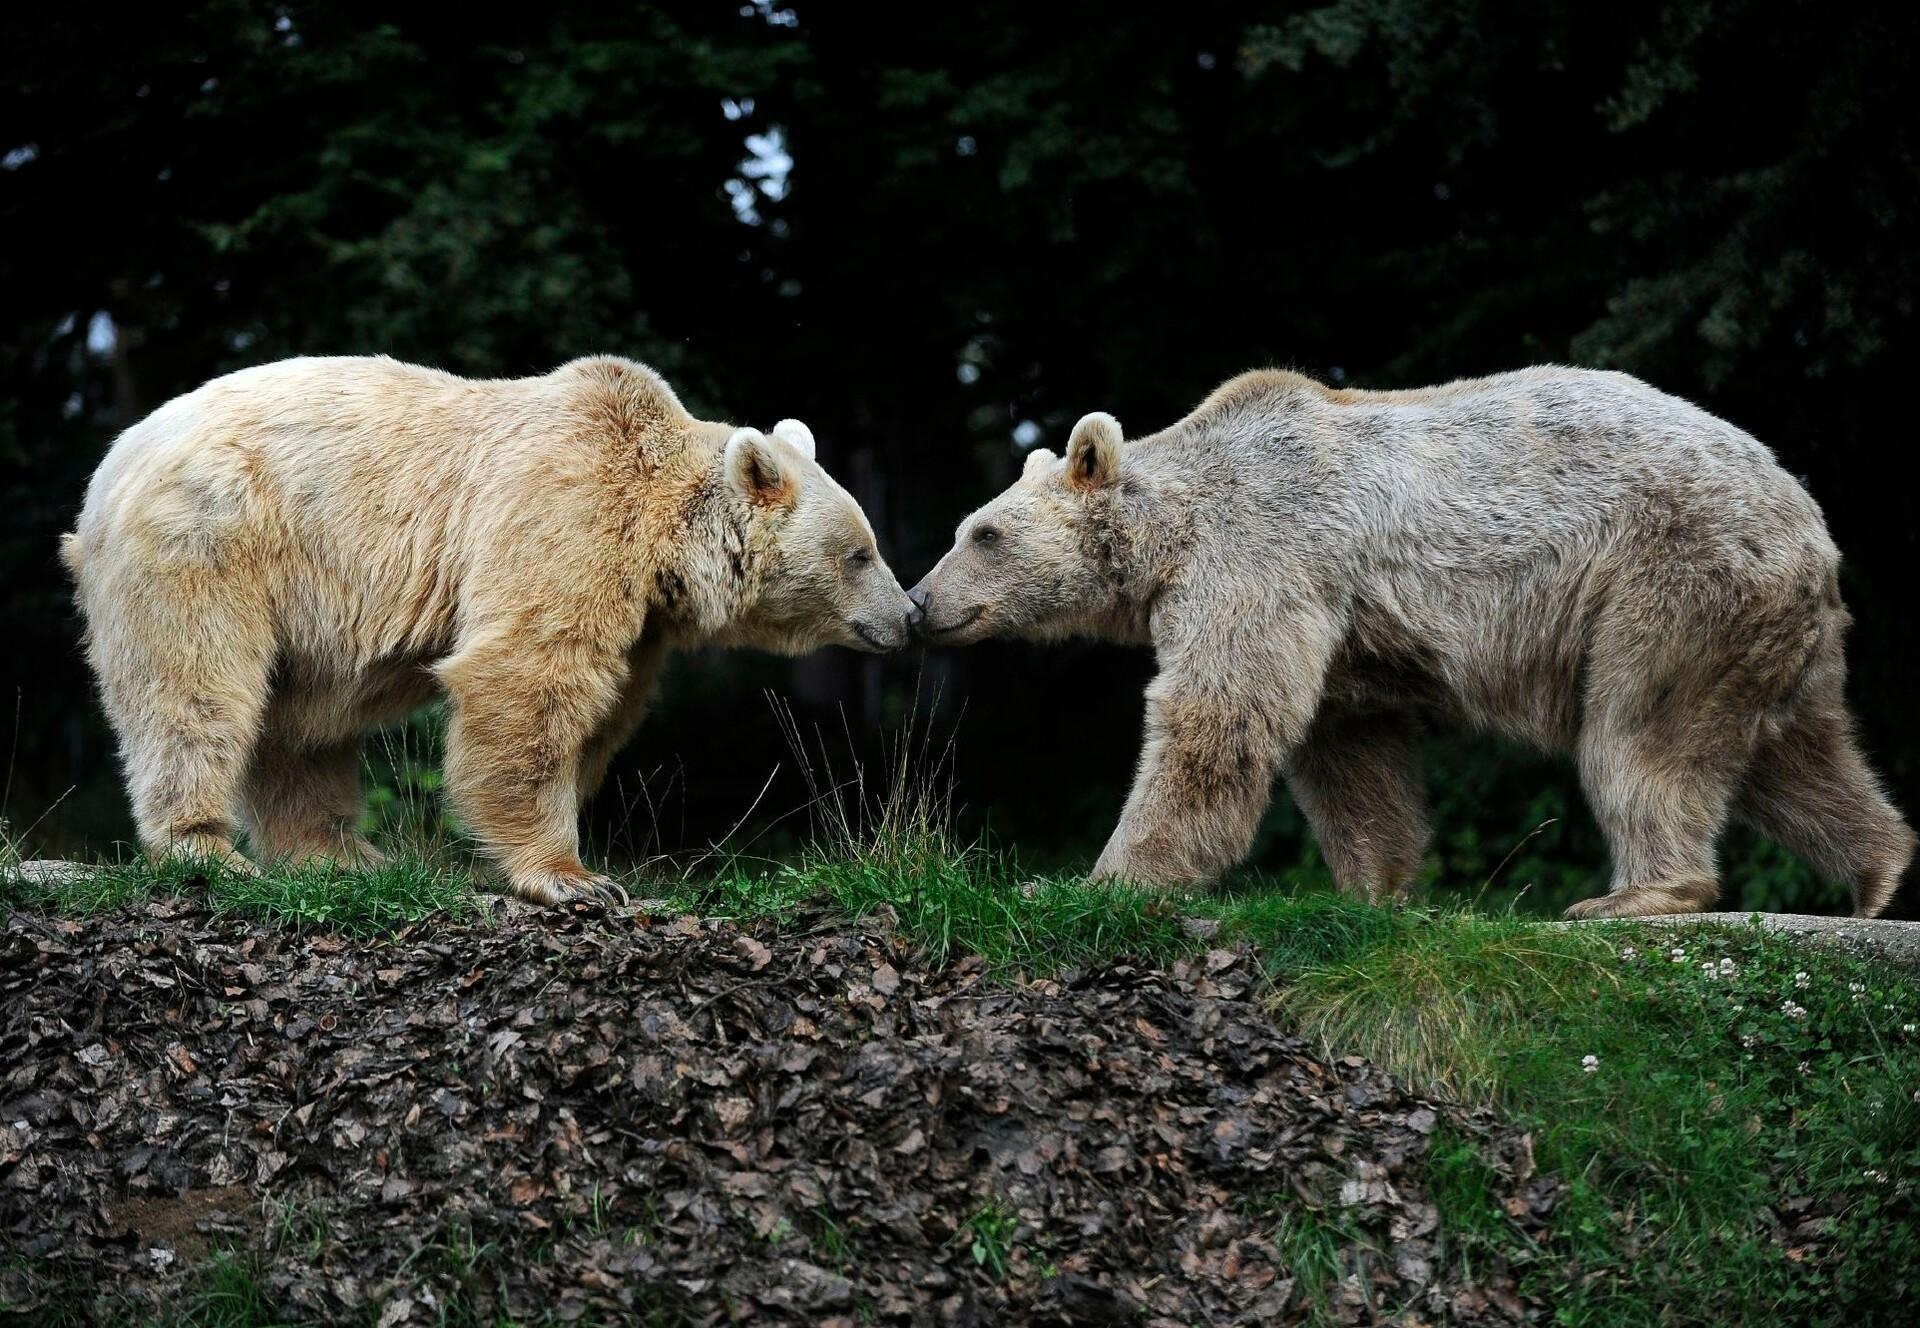 Bears at BEAR SANCTUARY Arbesbach